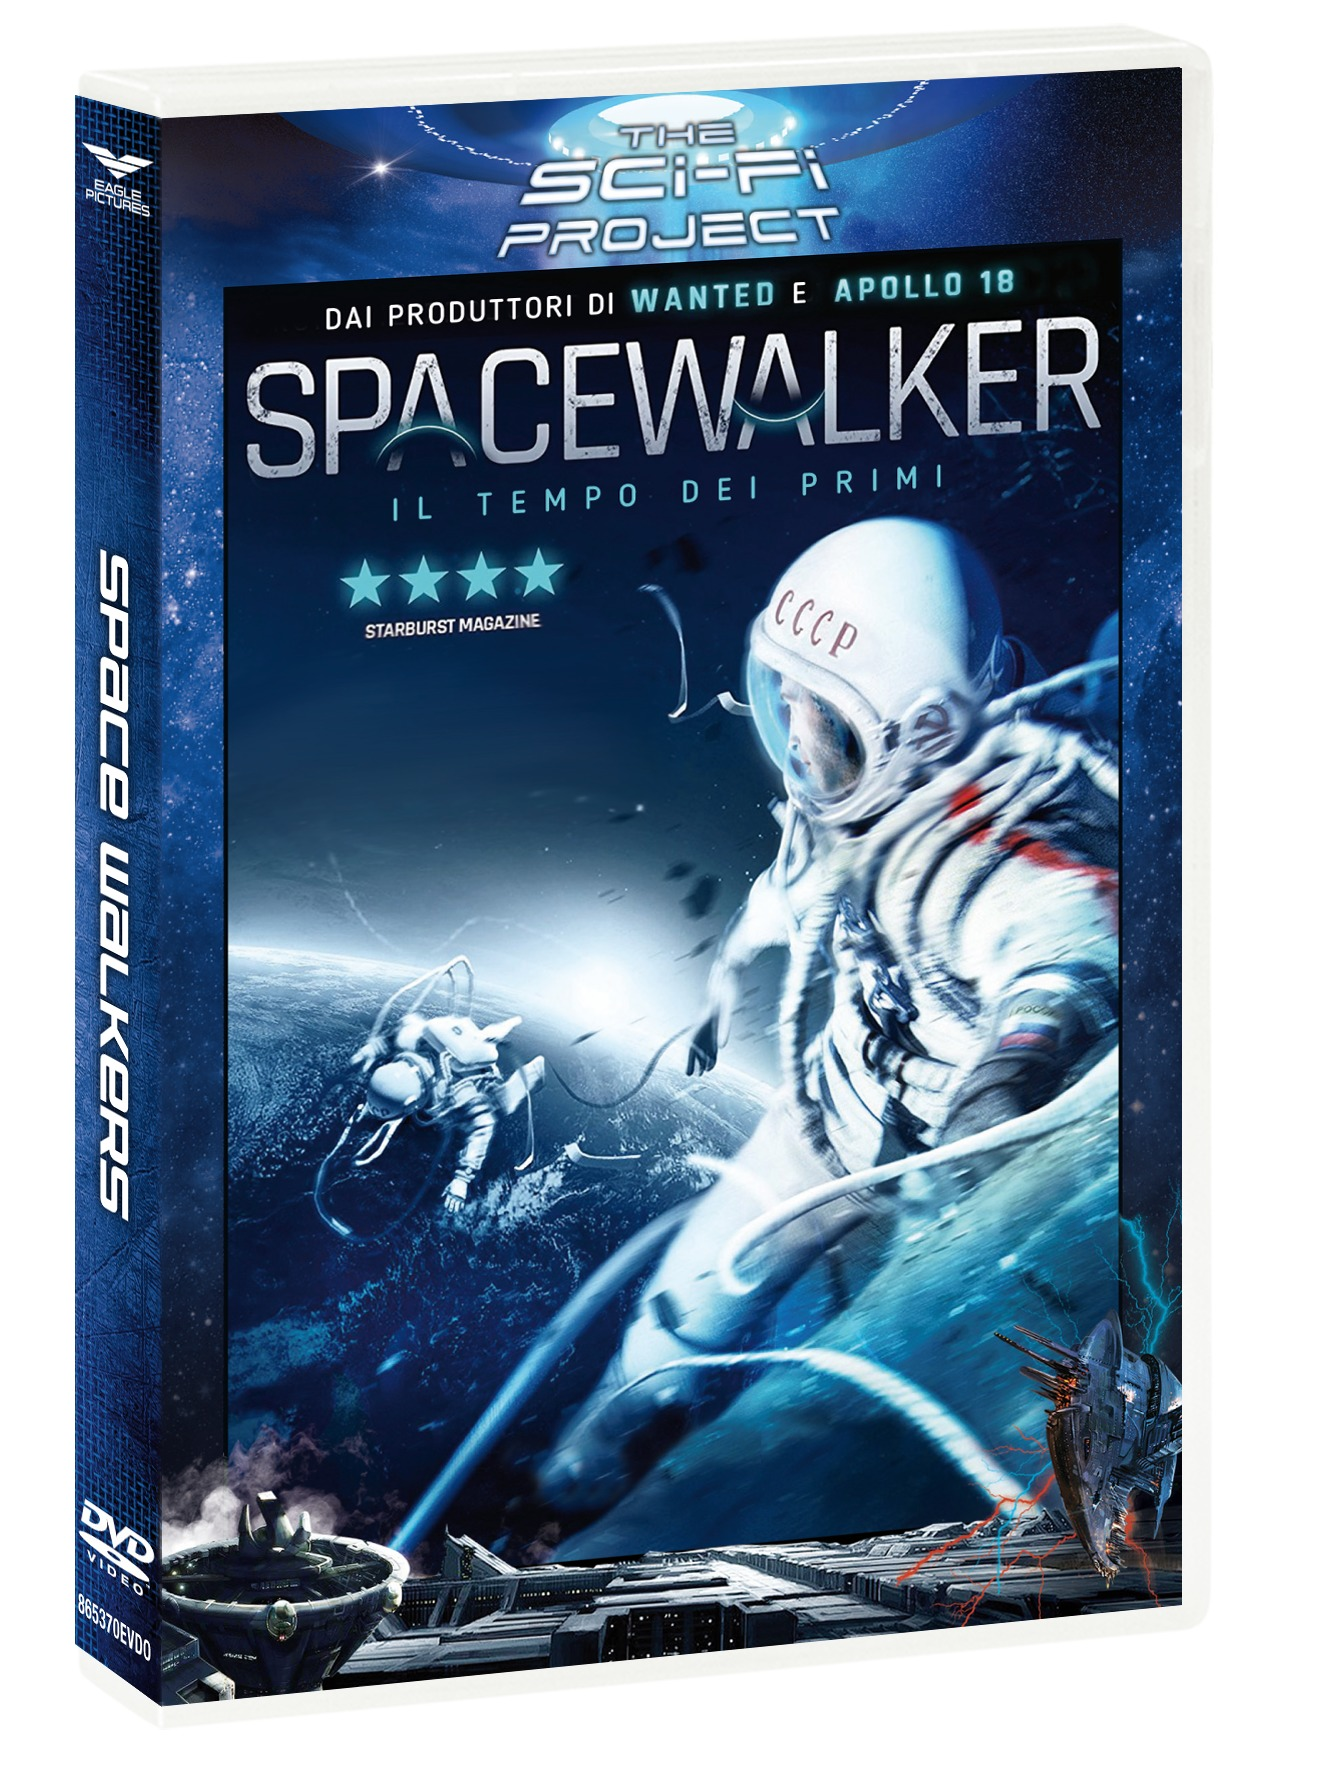 THE SPACEWALKER (SCI-FI PROJECT) (DVD)